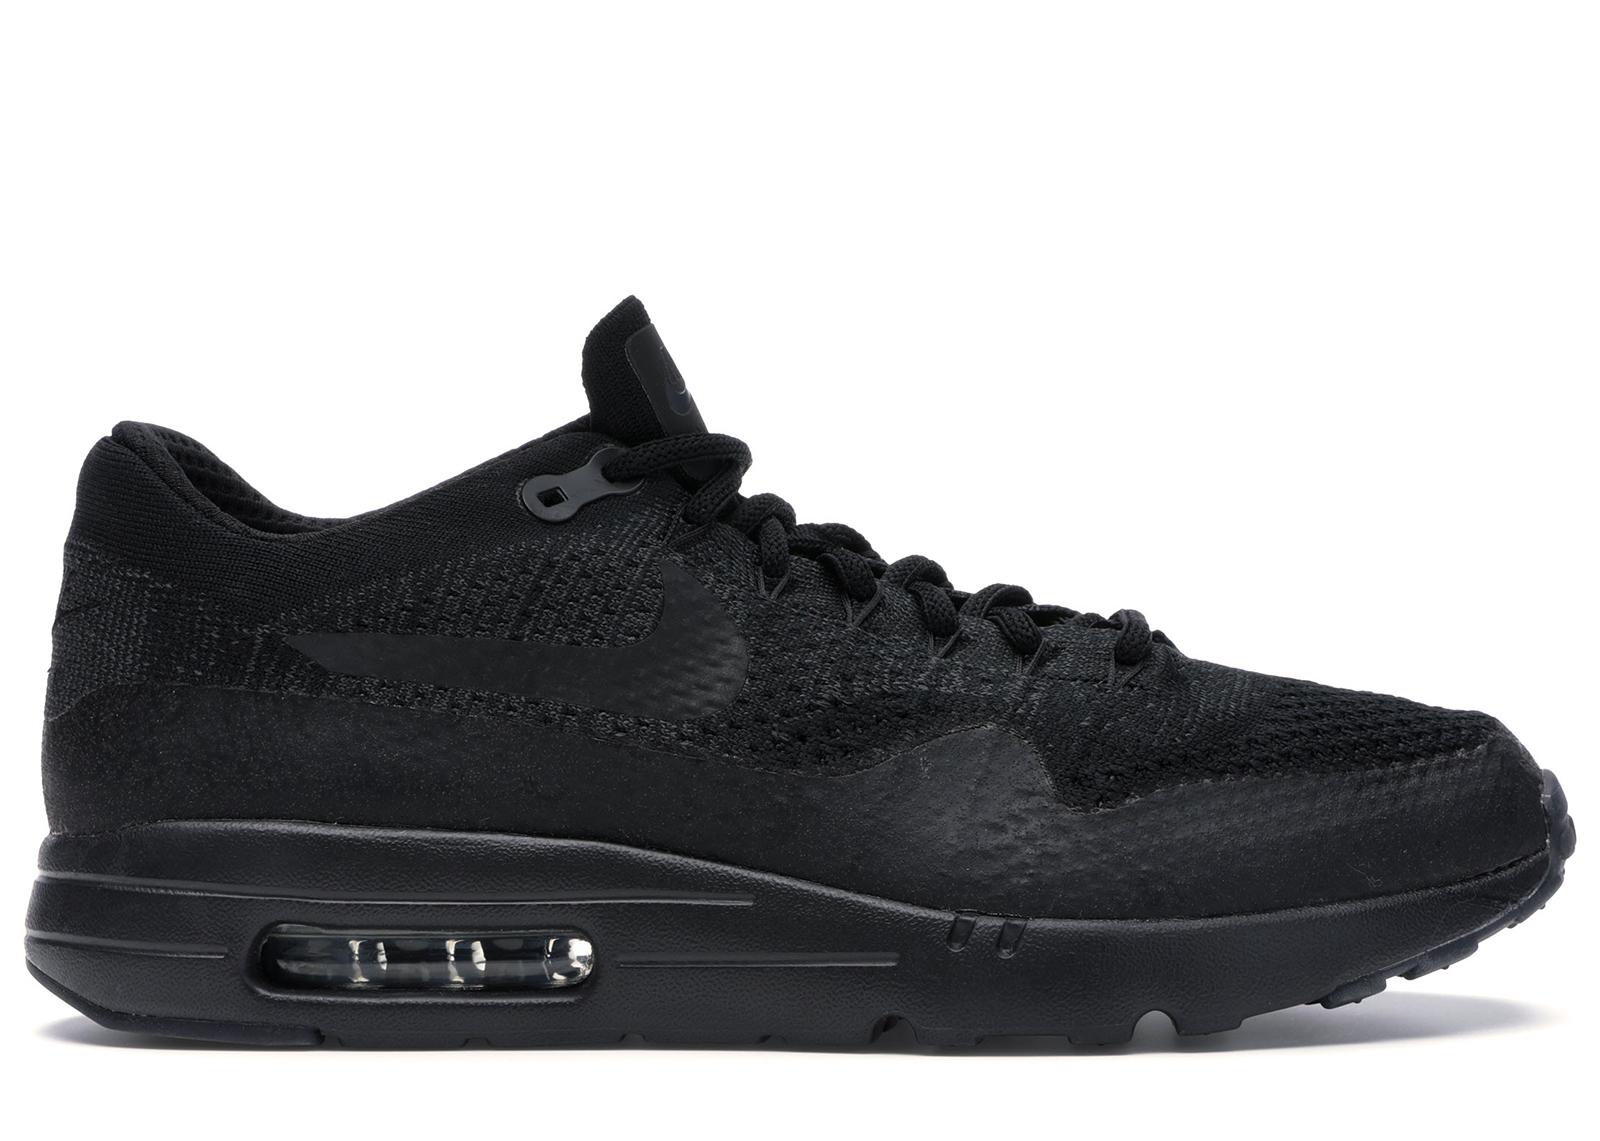 Nike Air Max 1 Ultra Flyknit Black/Black - 856958-001